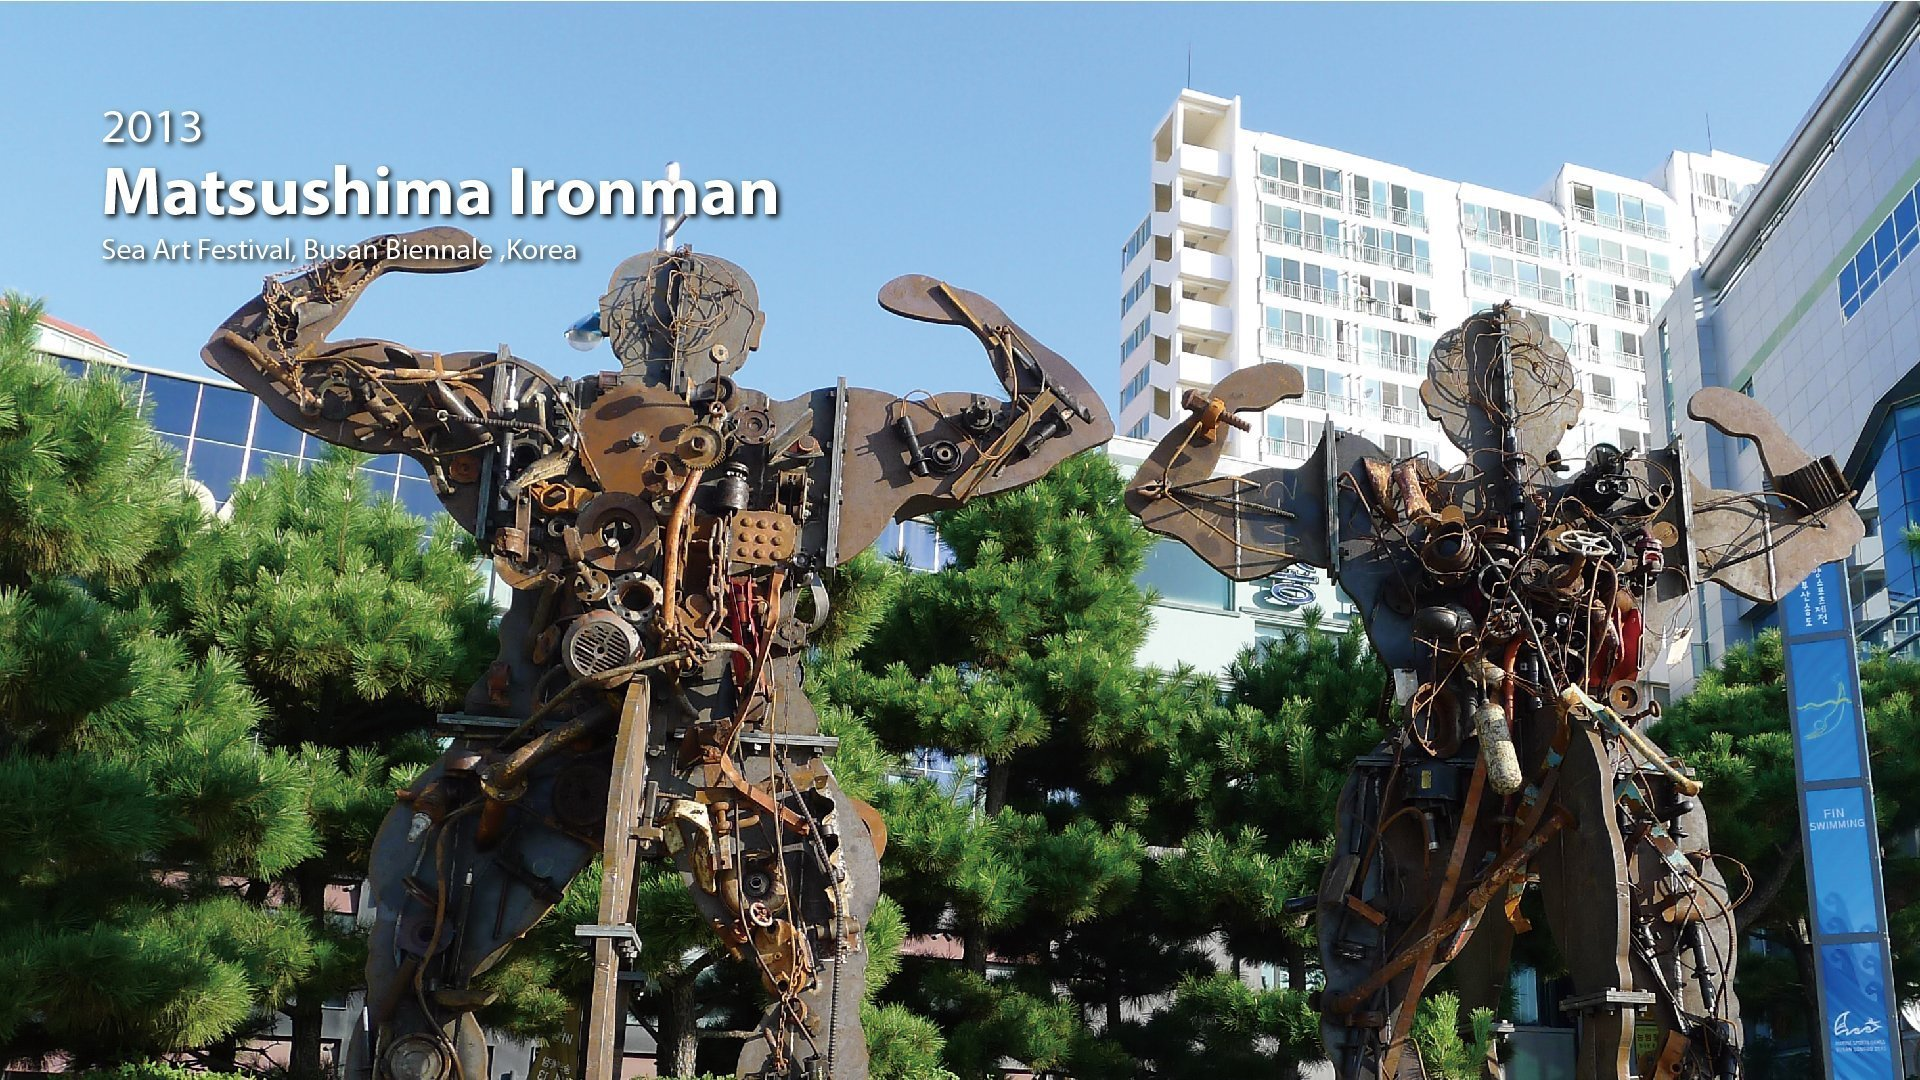 2013|Sea Art Festival, Busan Biennale ,Korea -